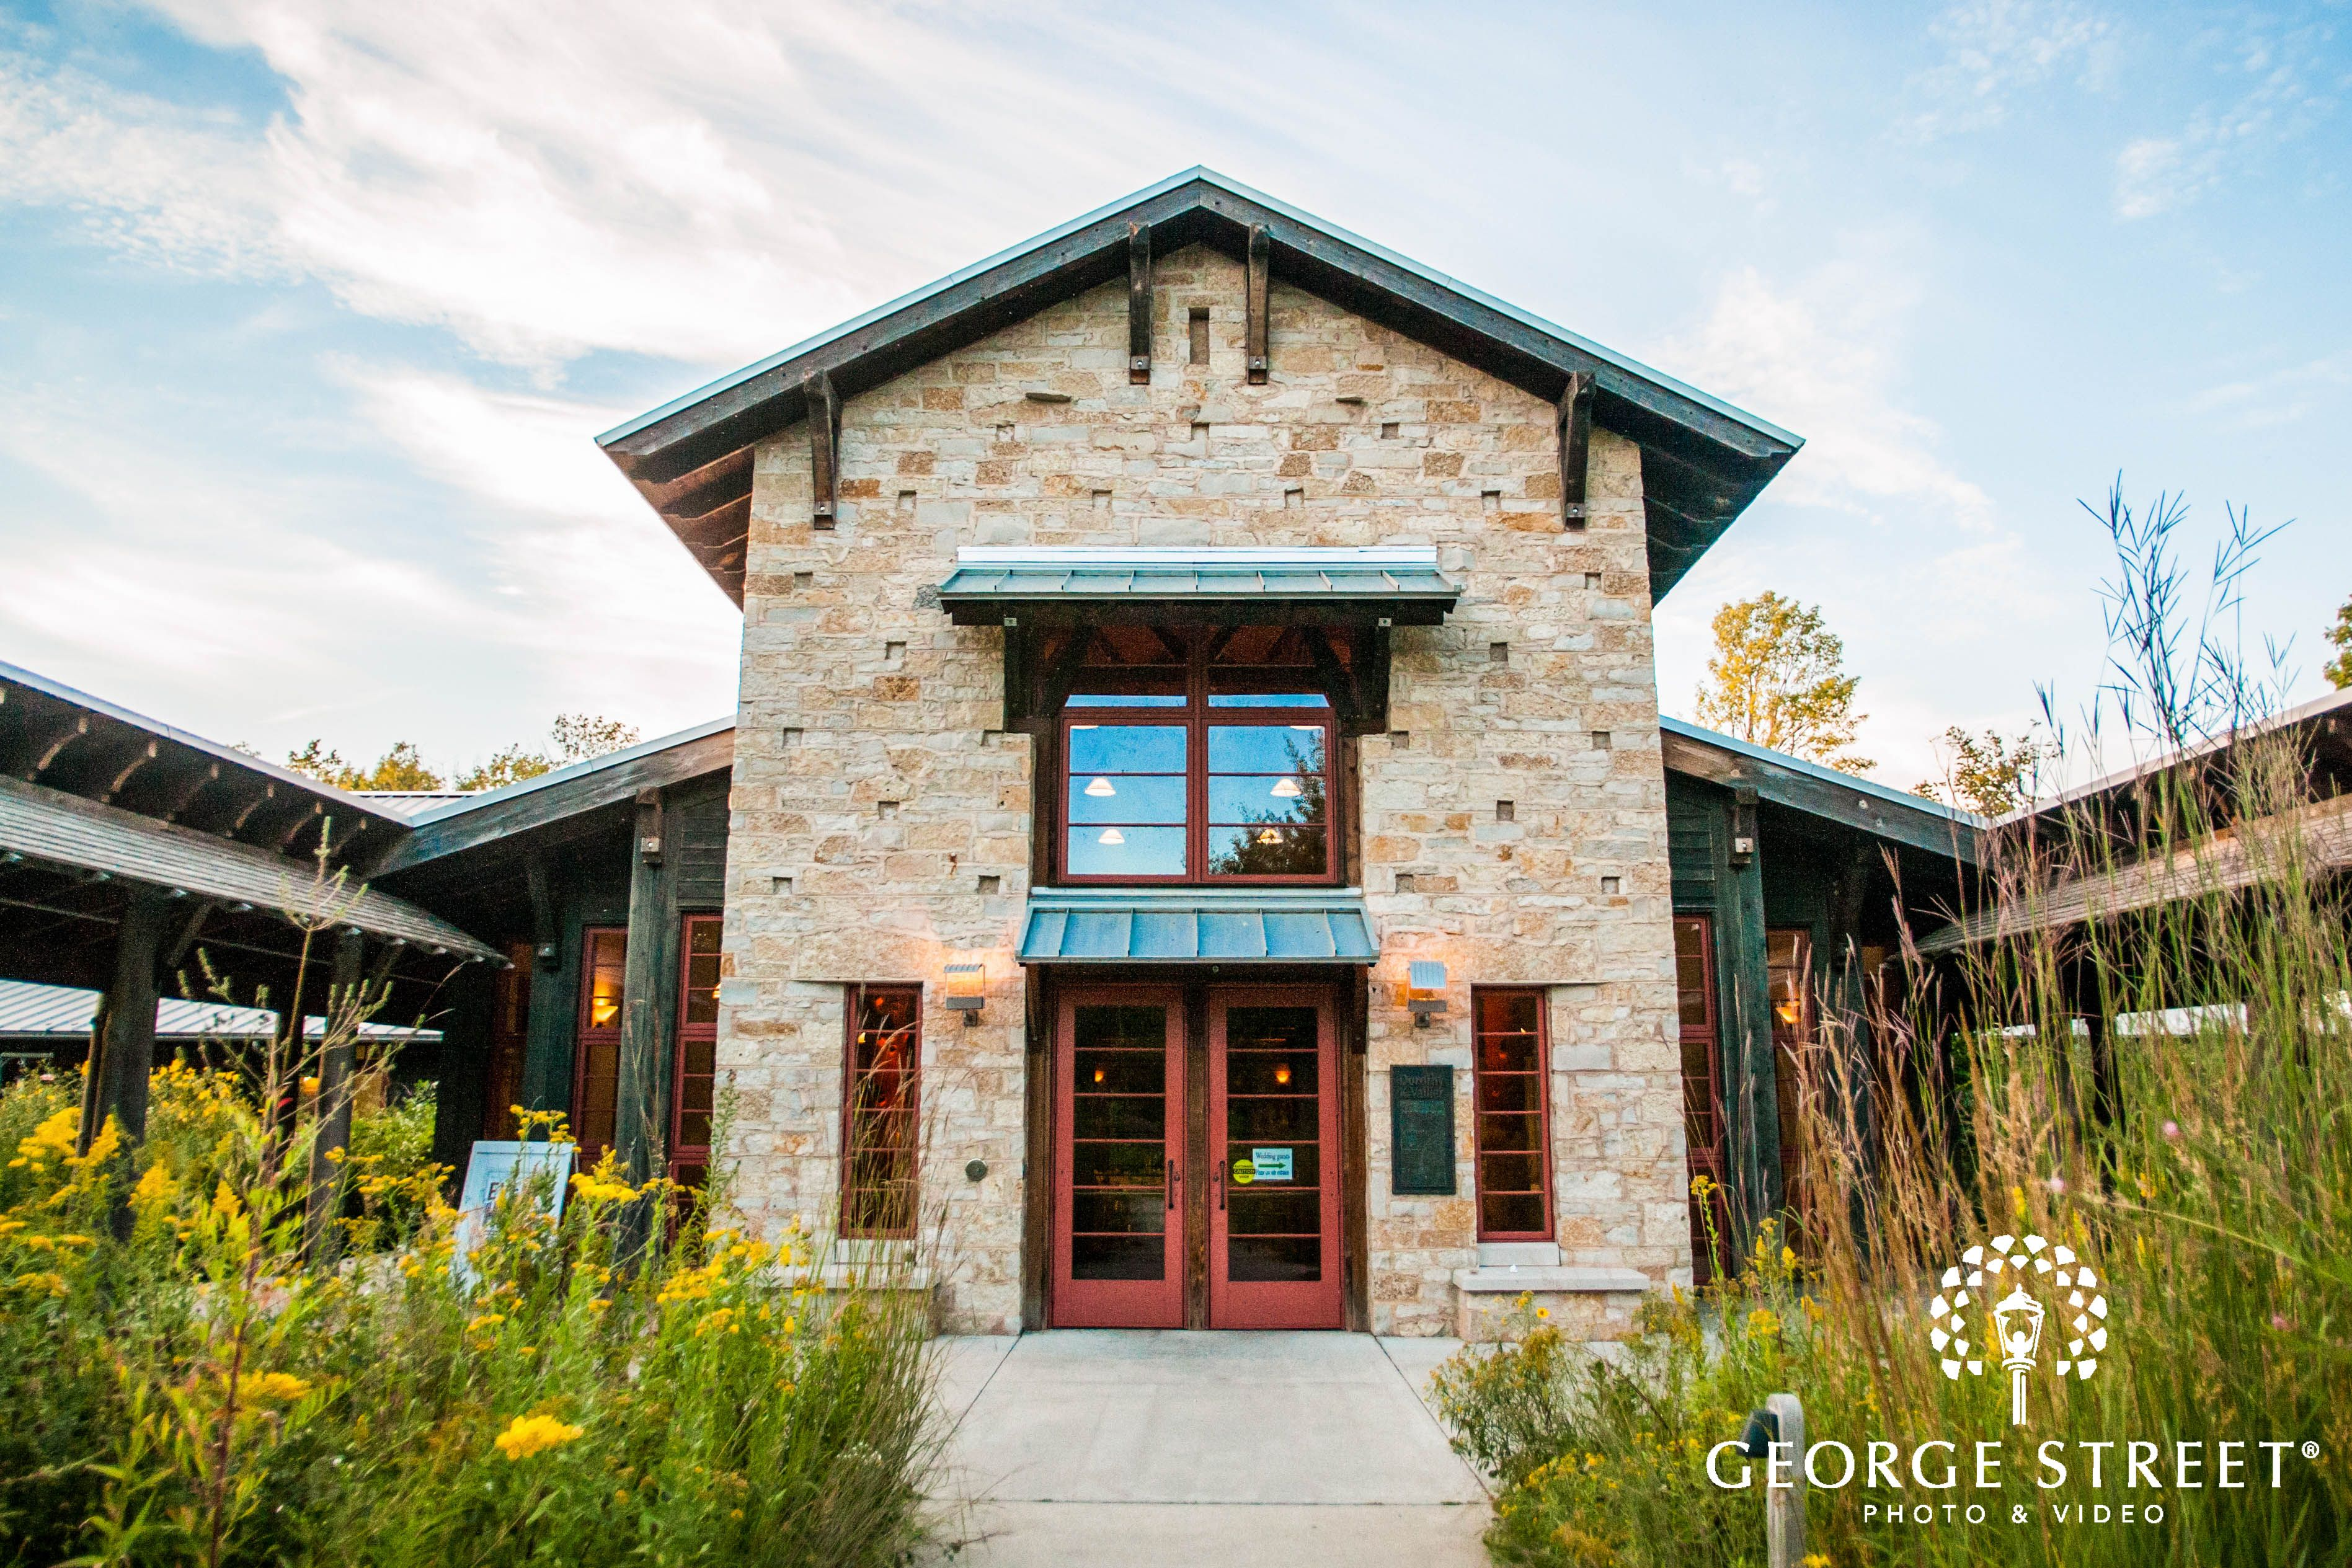 Schlitz Audubon Nature Center Inexpensive place to have